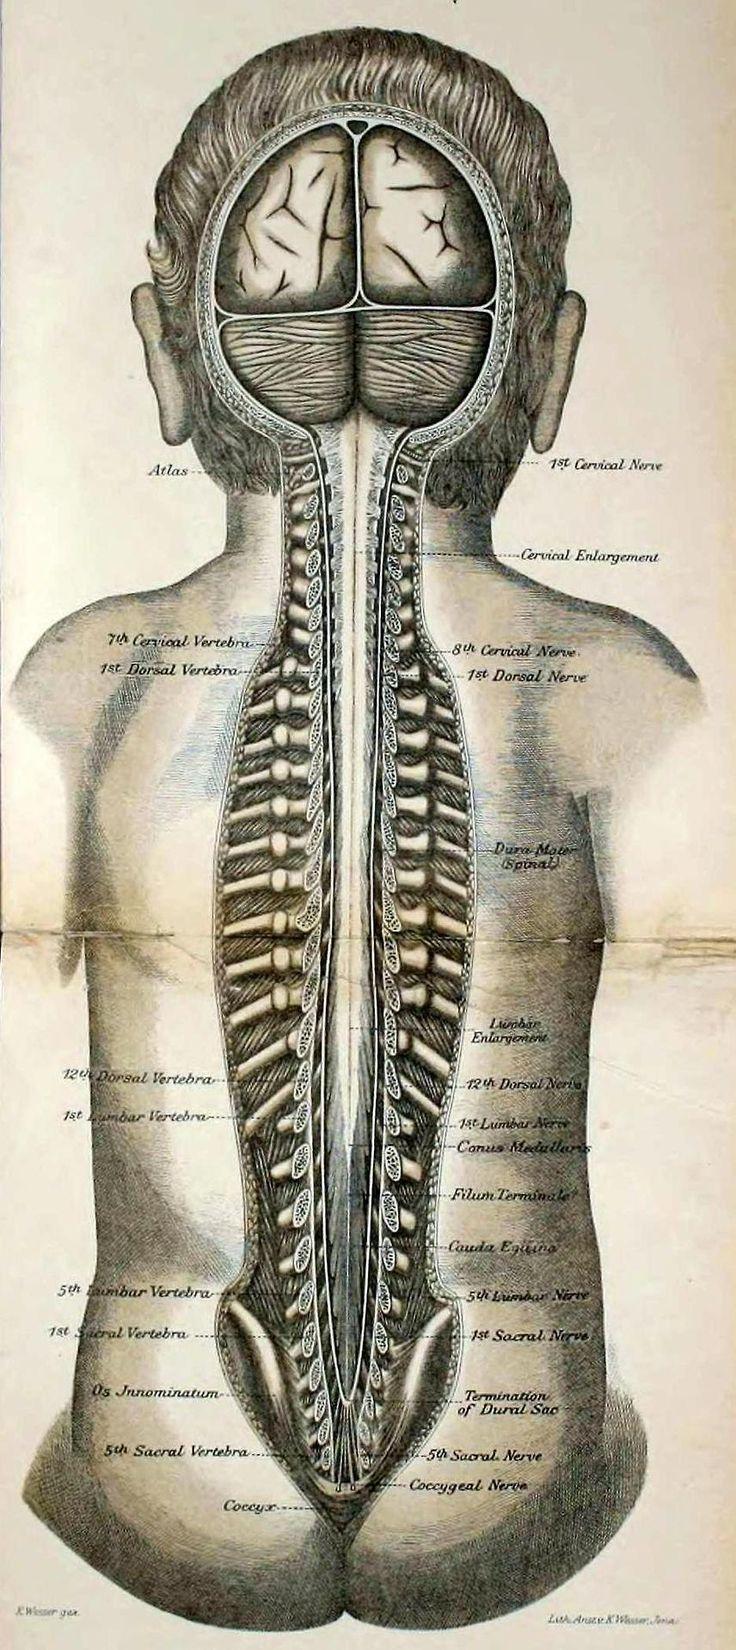 342 best avec à corps images on Pinterest | Anatomy, Medical science ...